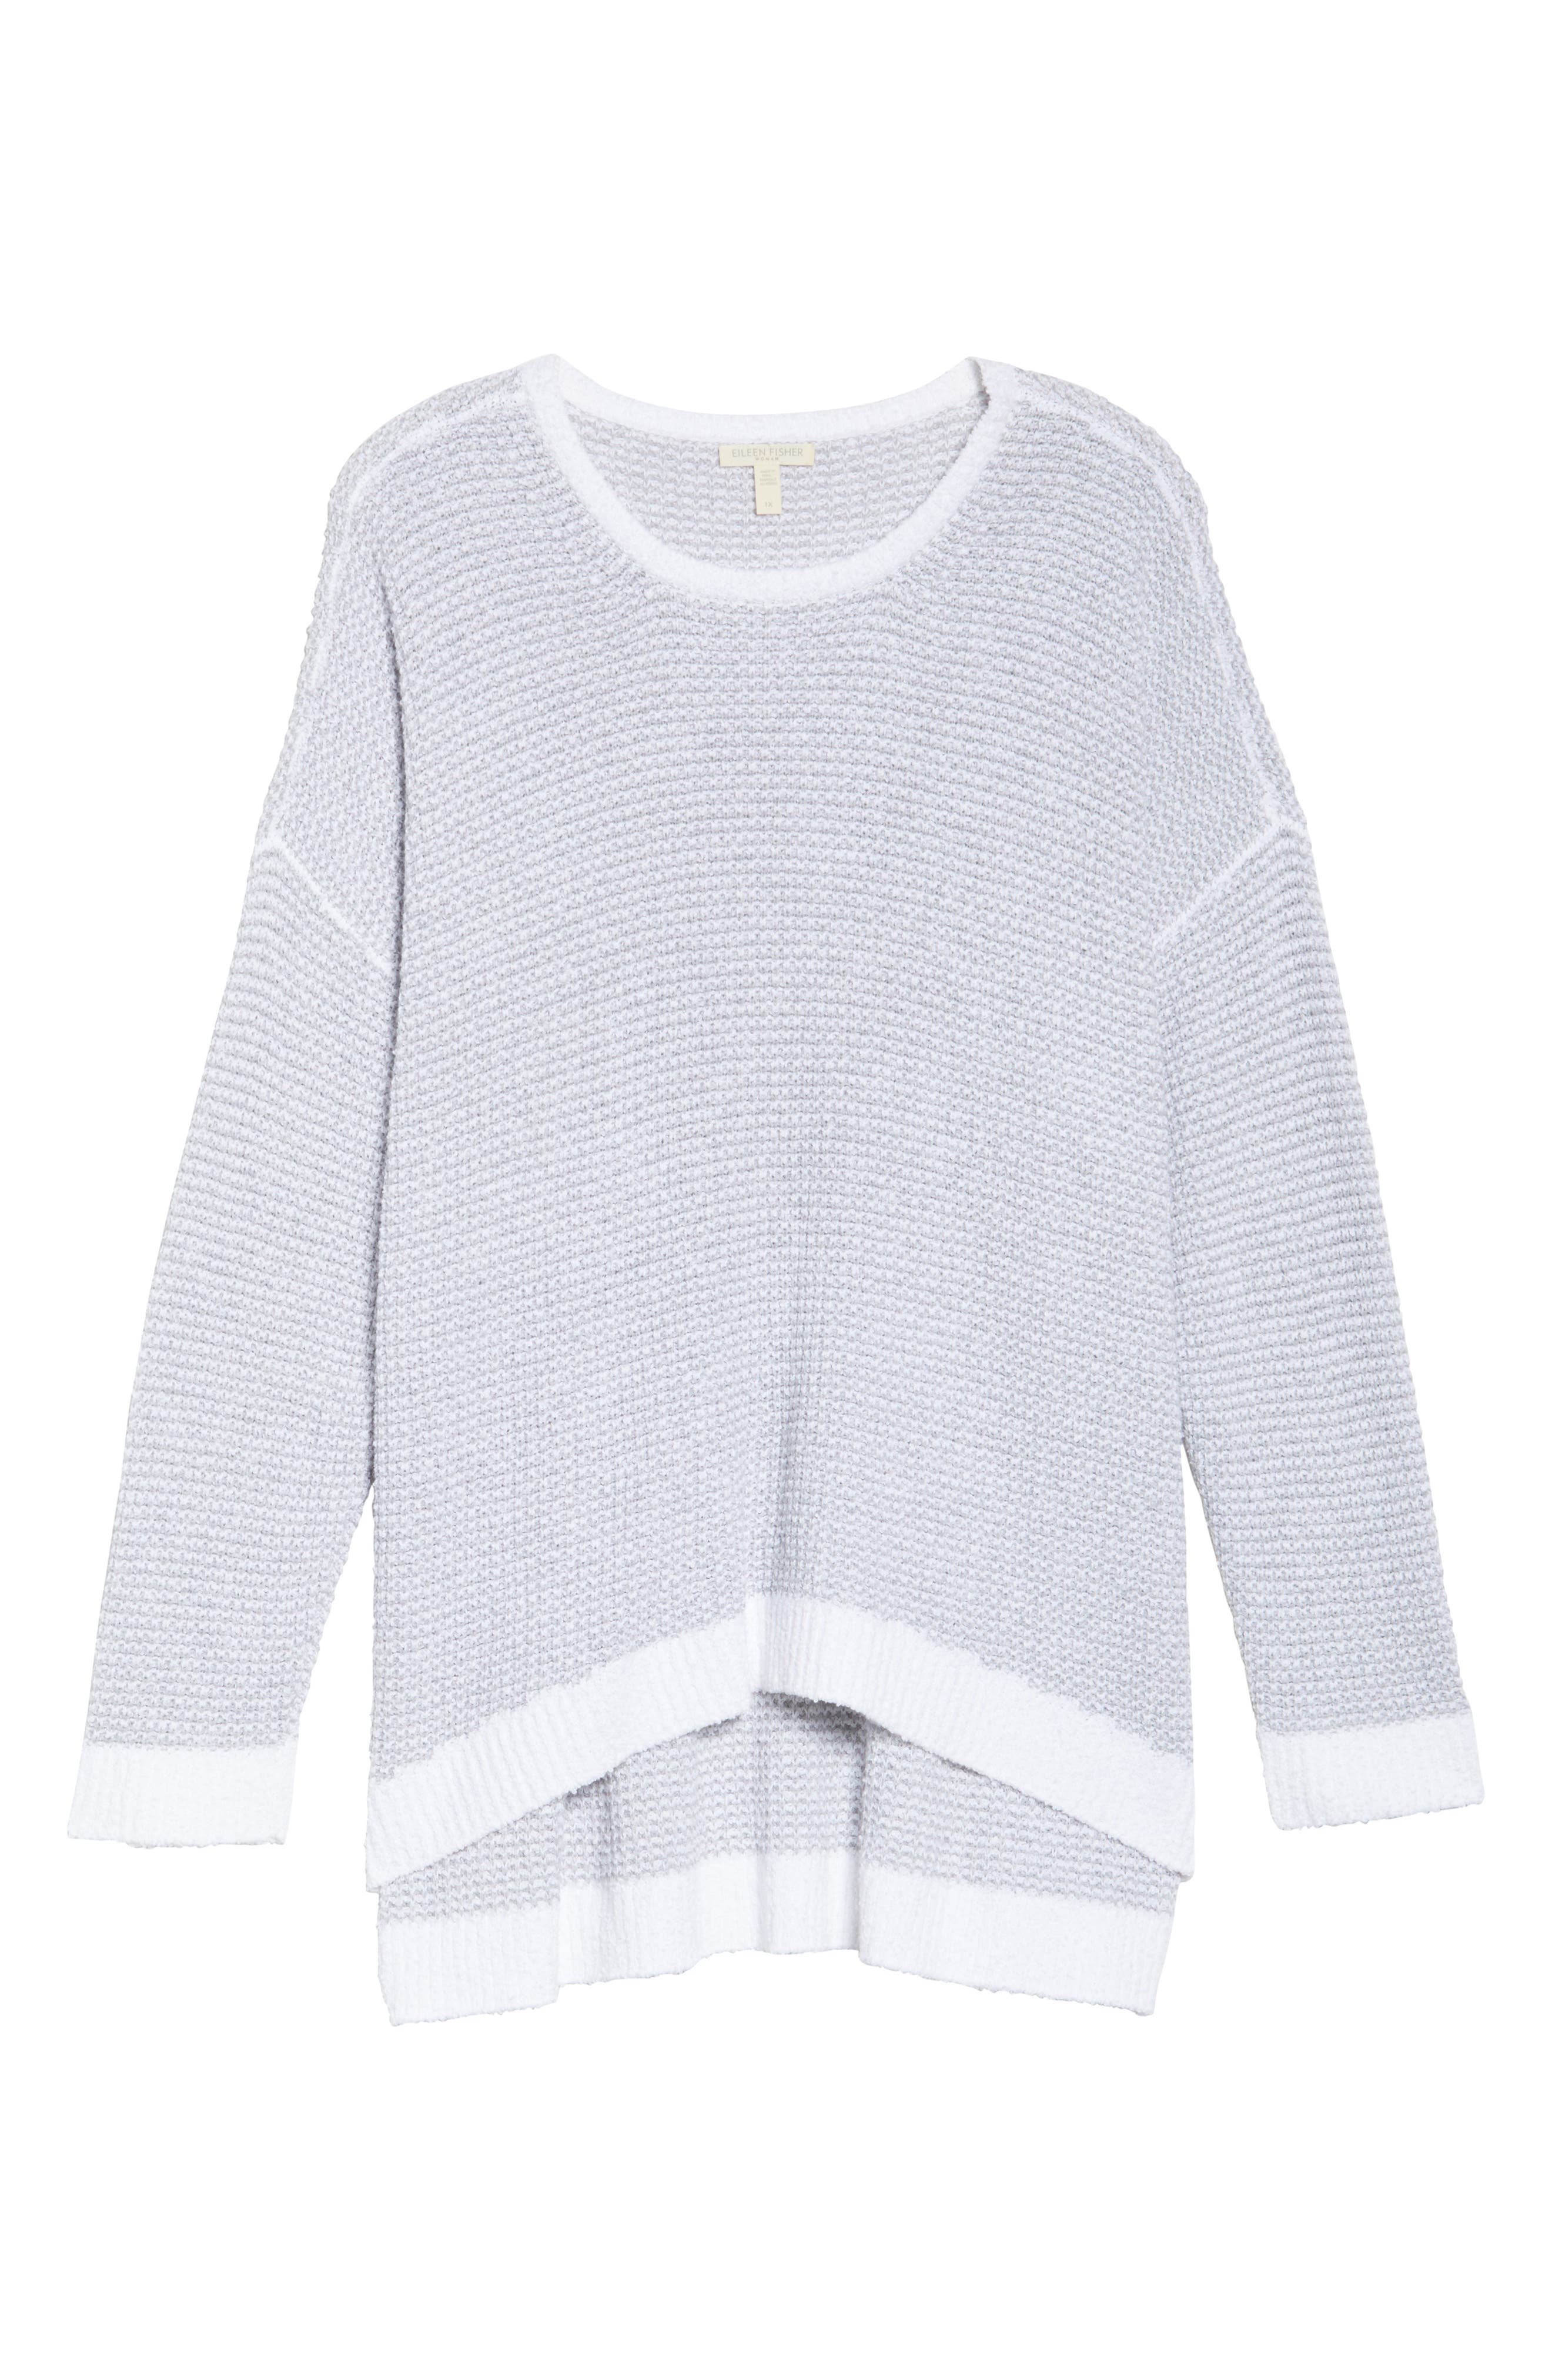 Waffled Organic Cotton Sweater,                             Alternate thumbnail 6, color,                             Grey